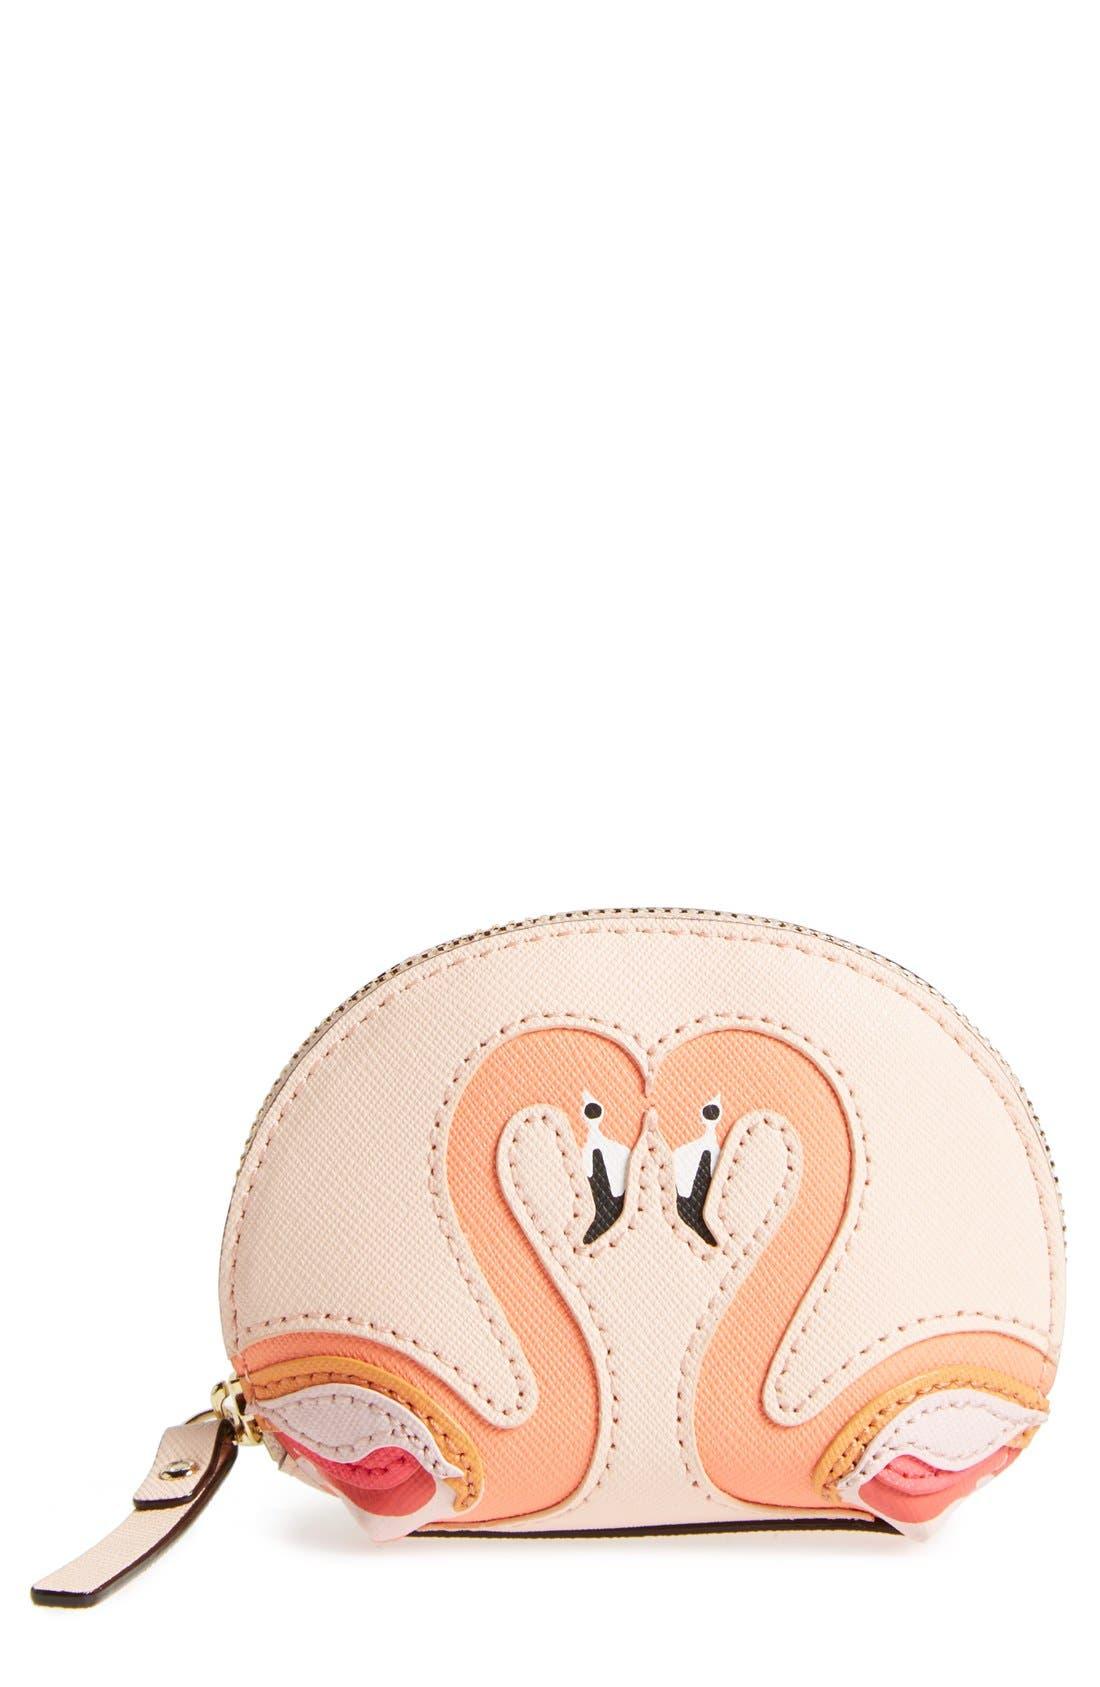 Alternate Image 1 Selected - kate spade new york 'strut flamingo' coin purse